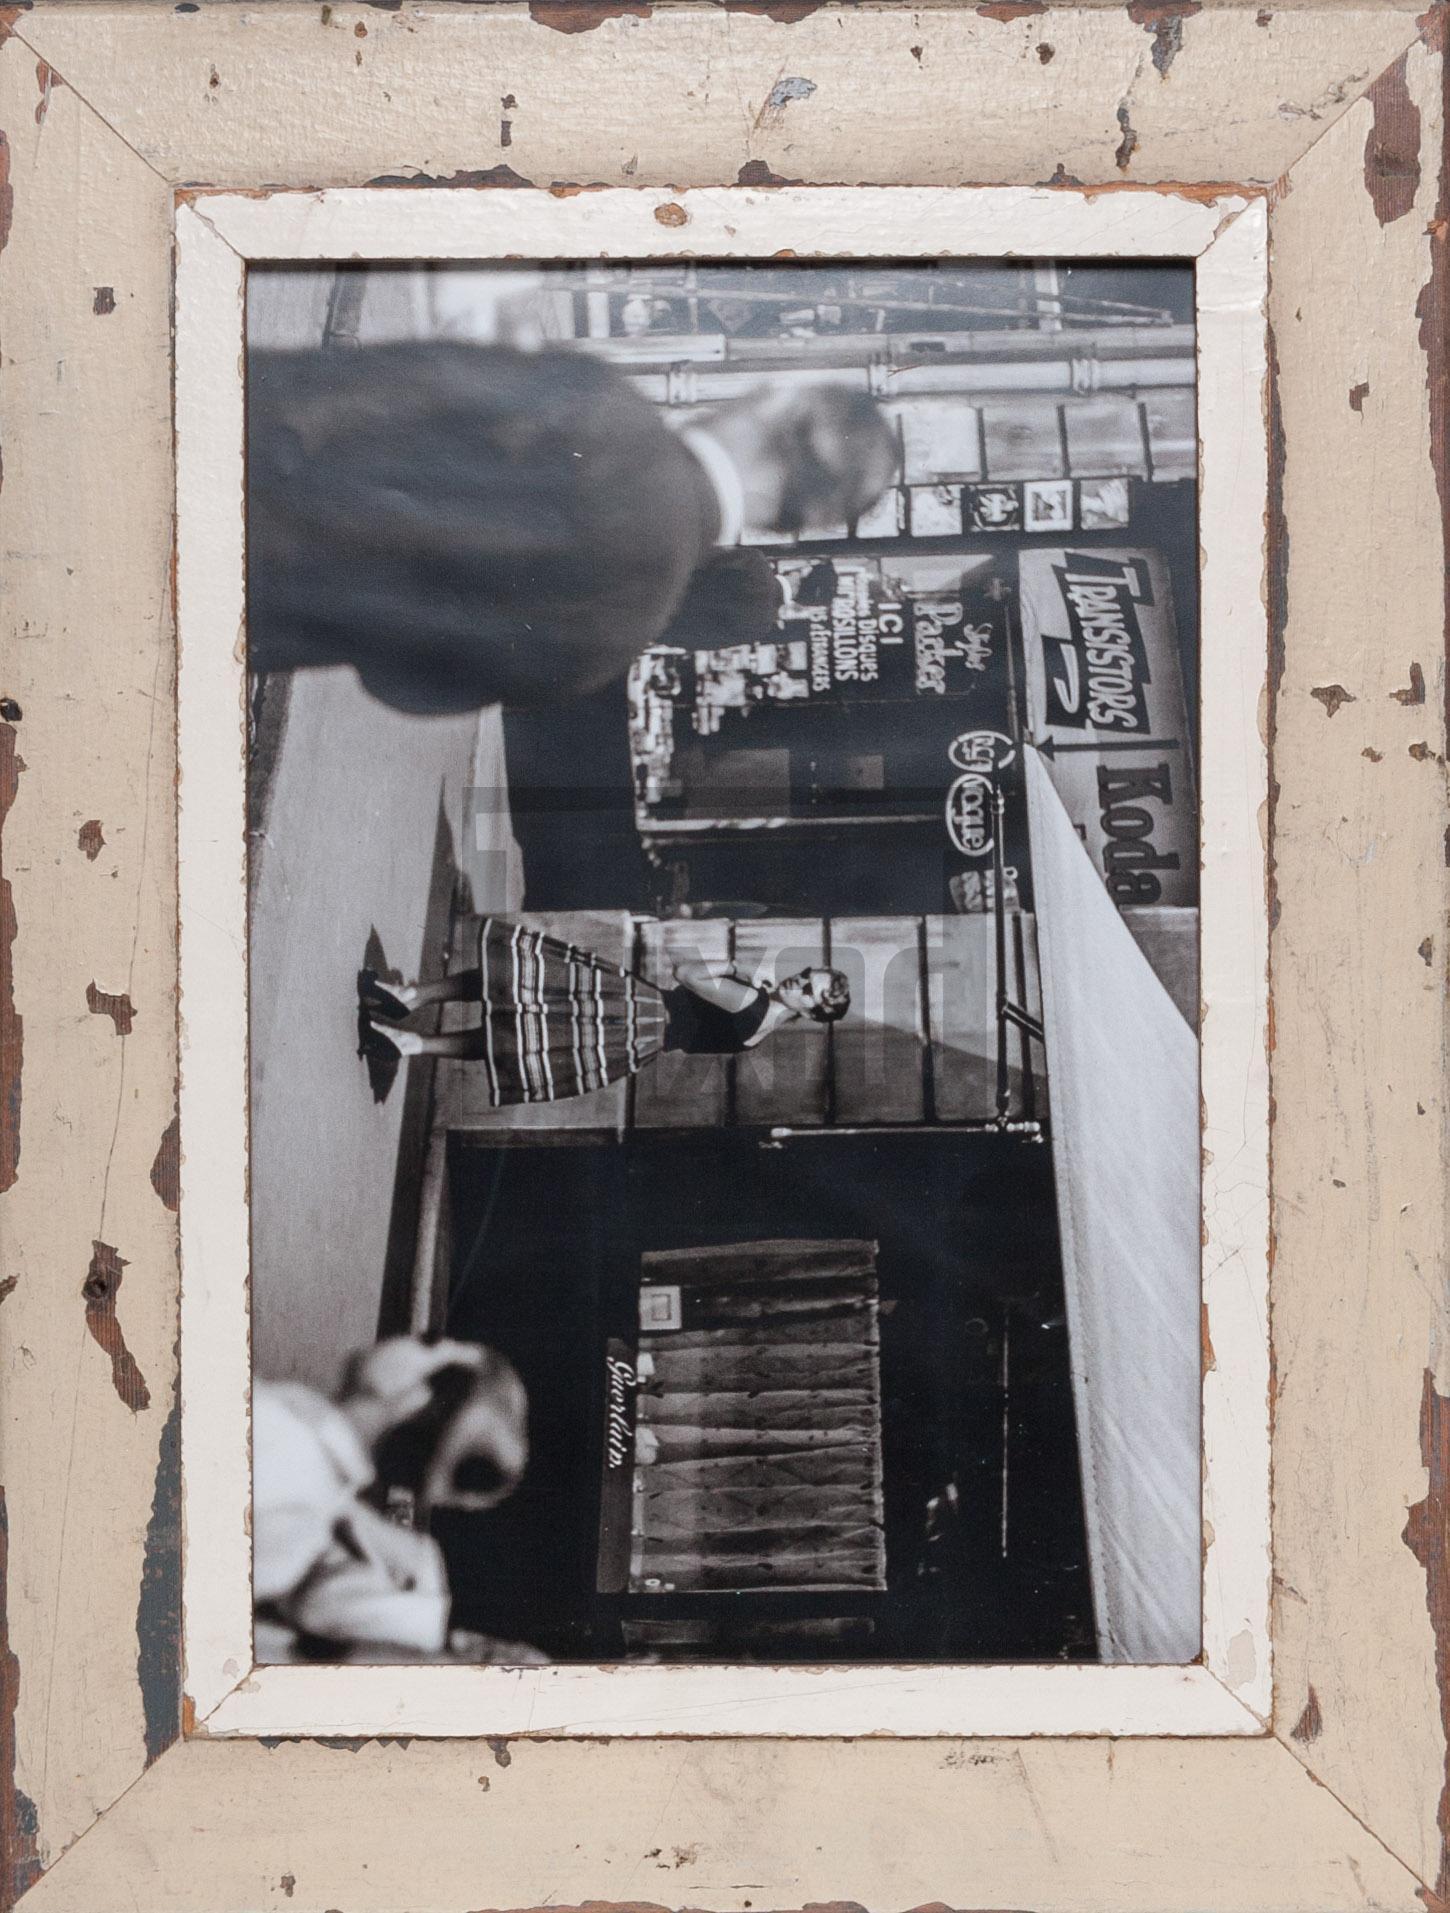 Holzbilderrahmen für ca. 29,7 x 42 cm große Fotos